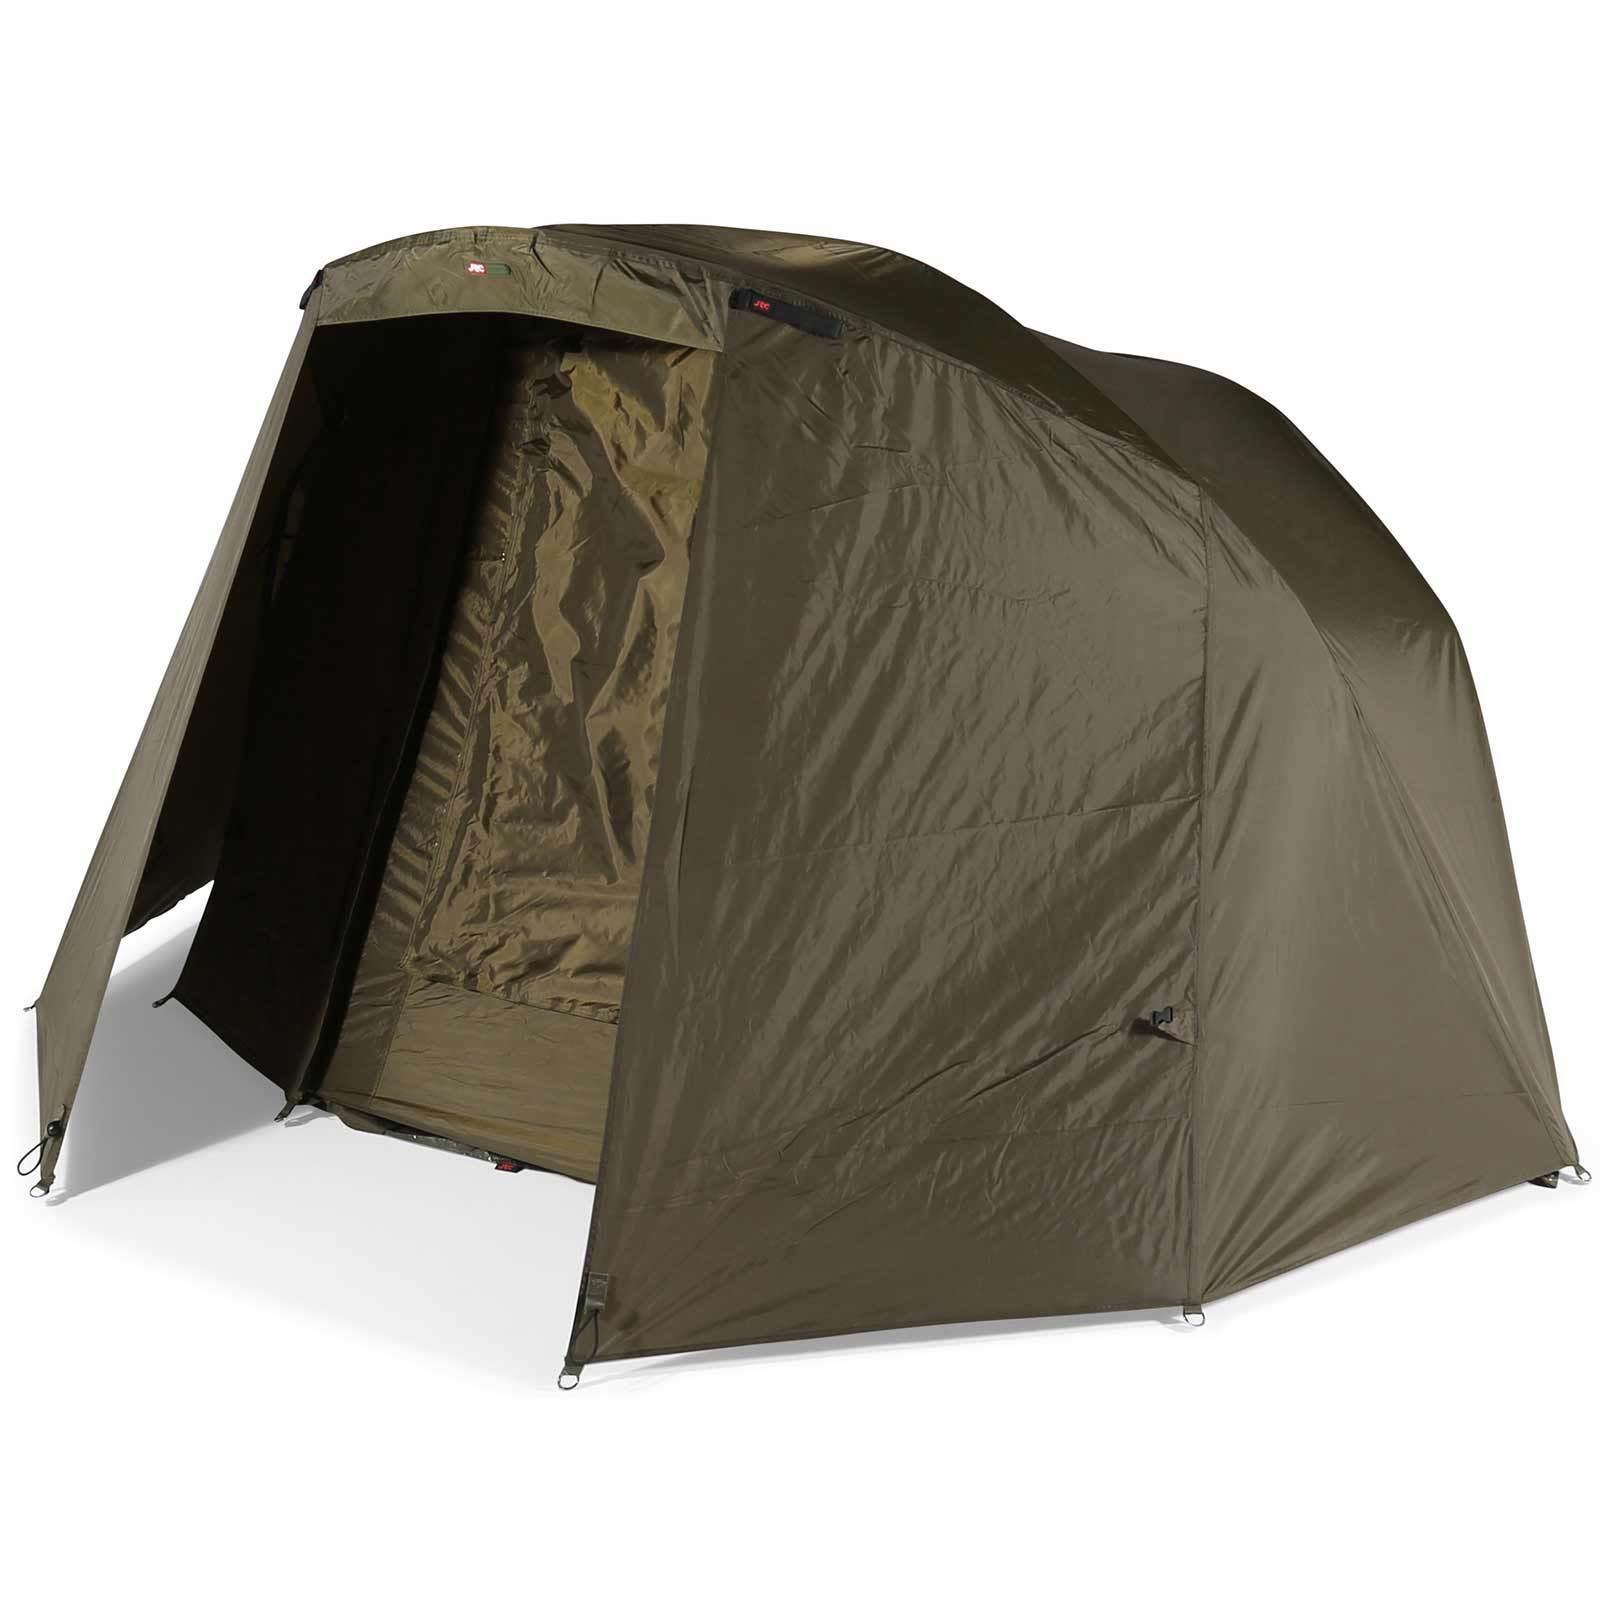 JRC su lancio Carpa Tenda Tenda Angel 1 Uomo TendaDefender Peak Bivy 2,2kg